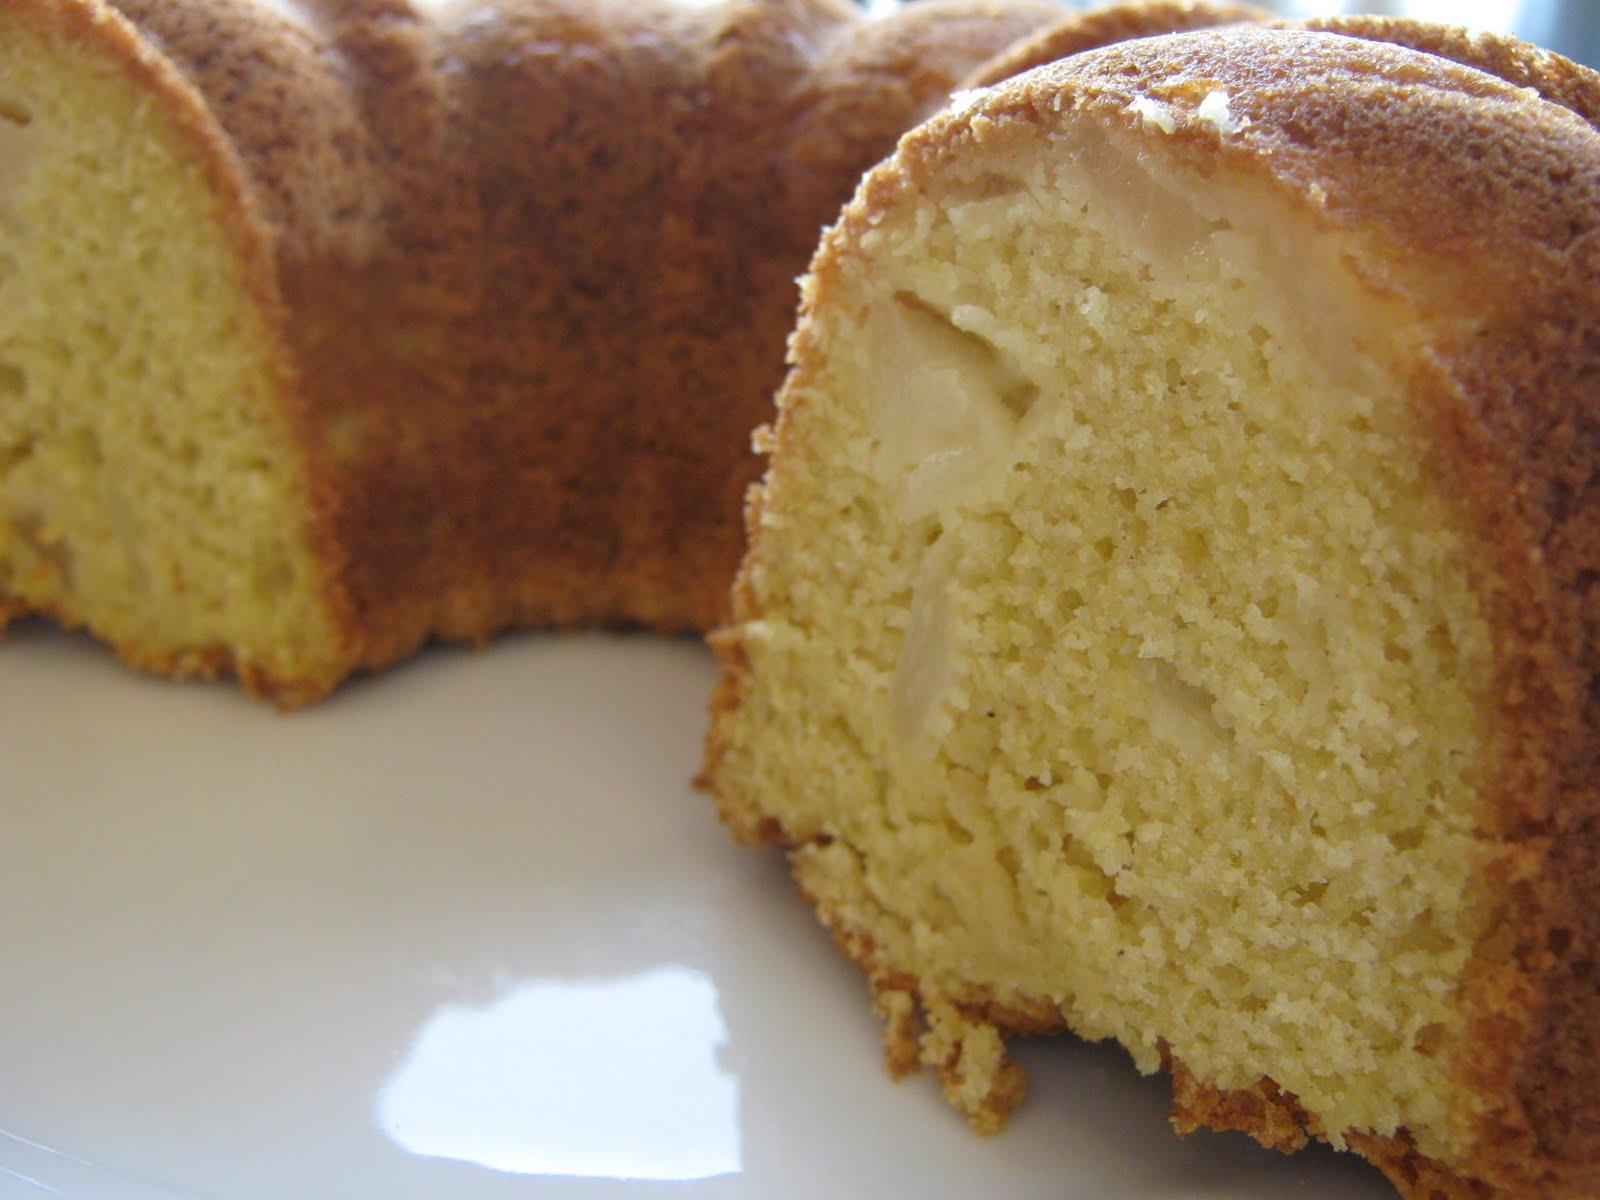 Recette Cake Poire P Ef Bf Bdpites Chocolat